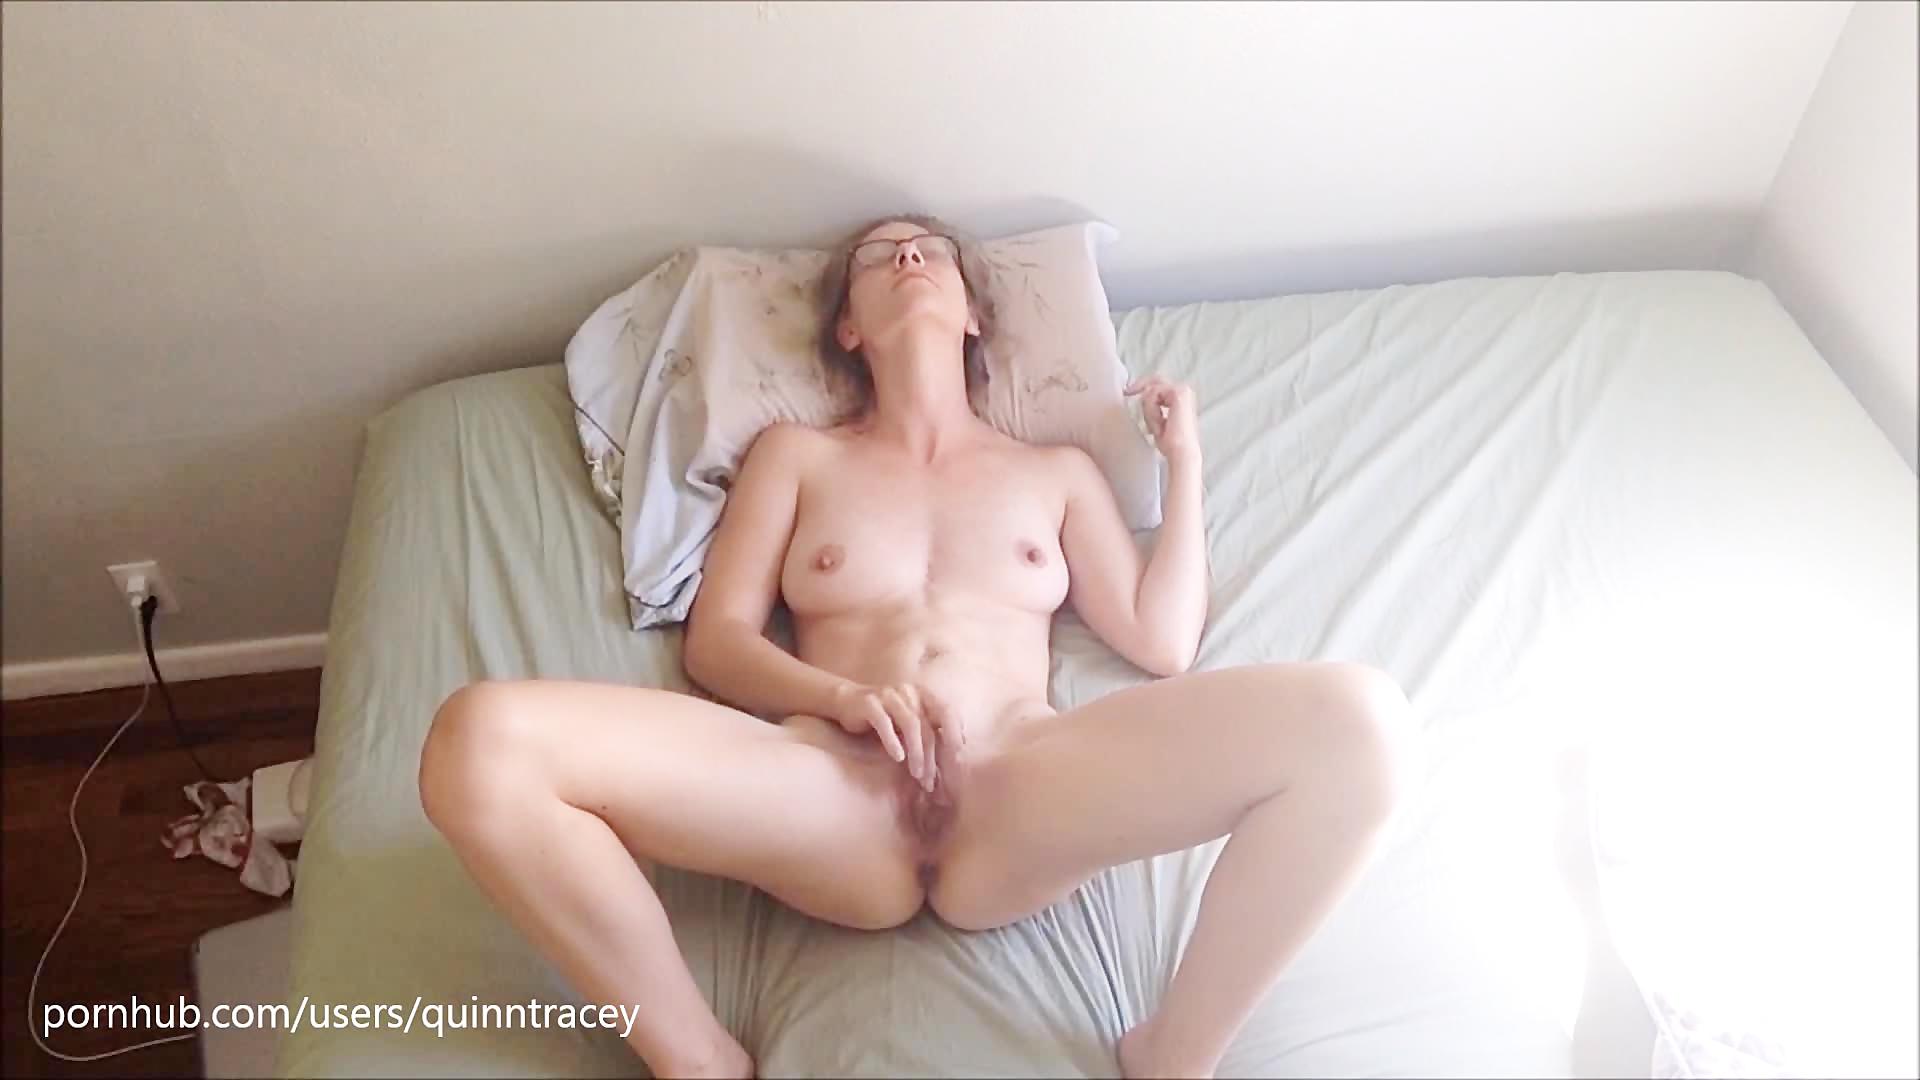 virgin sex hardcore pics